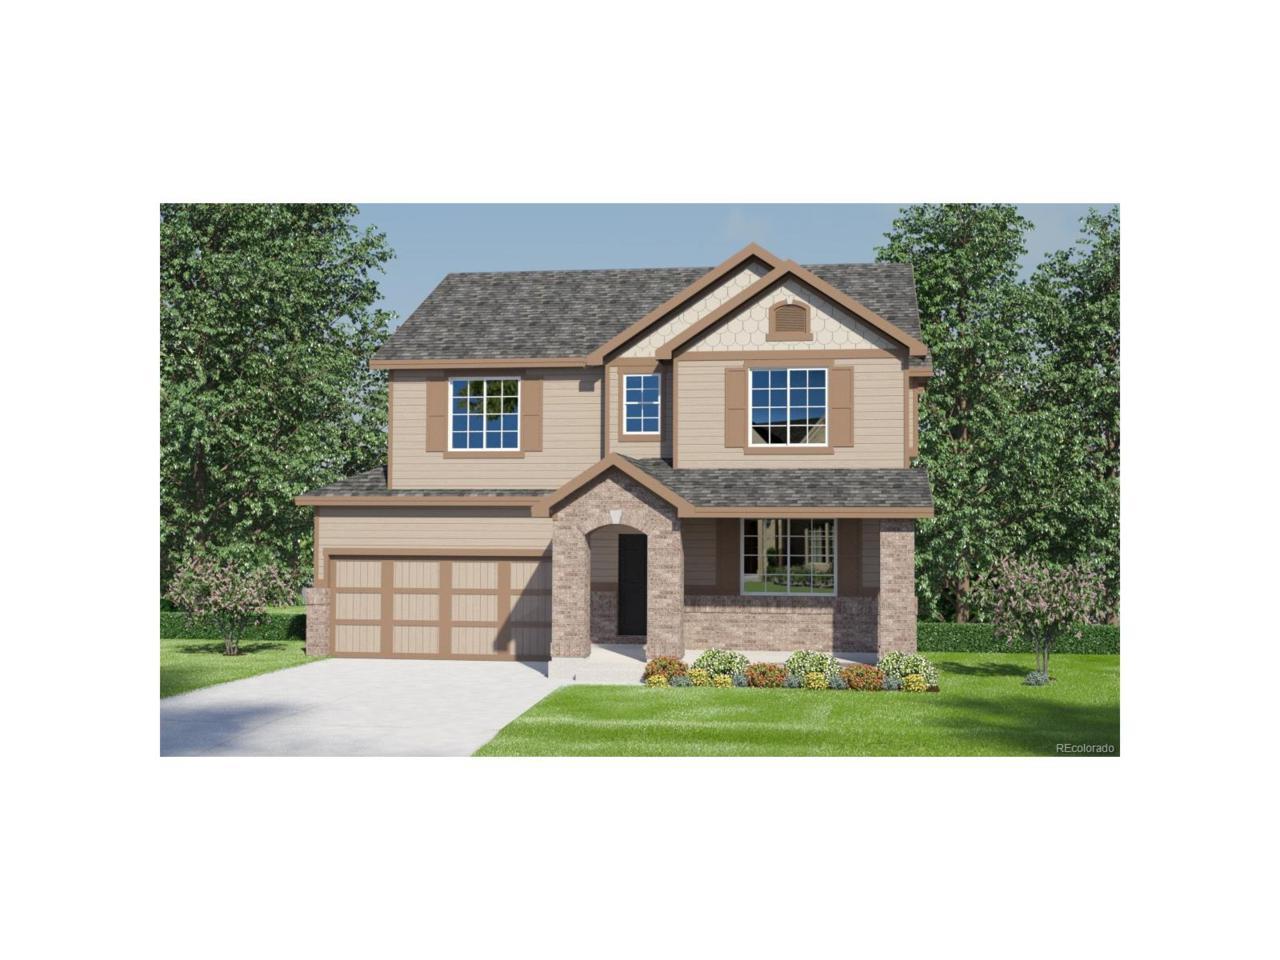 2429 Steppe Drive, Longmont, CO 80504 (MLS #9095859) :: 8z Real Estate